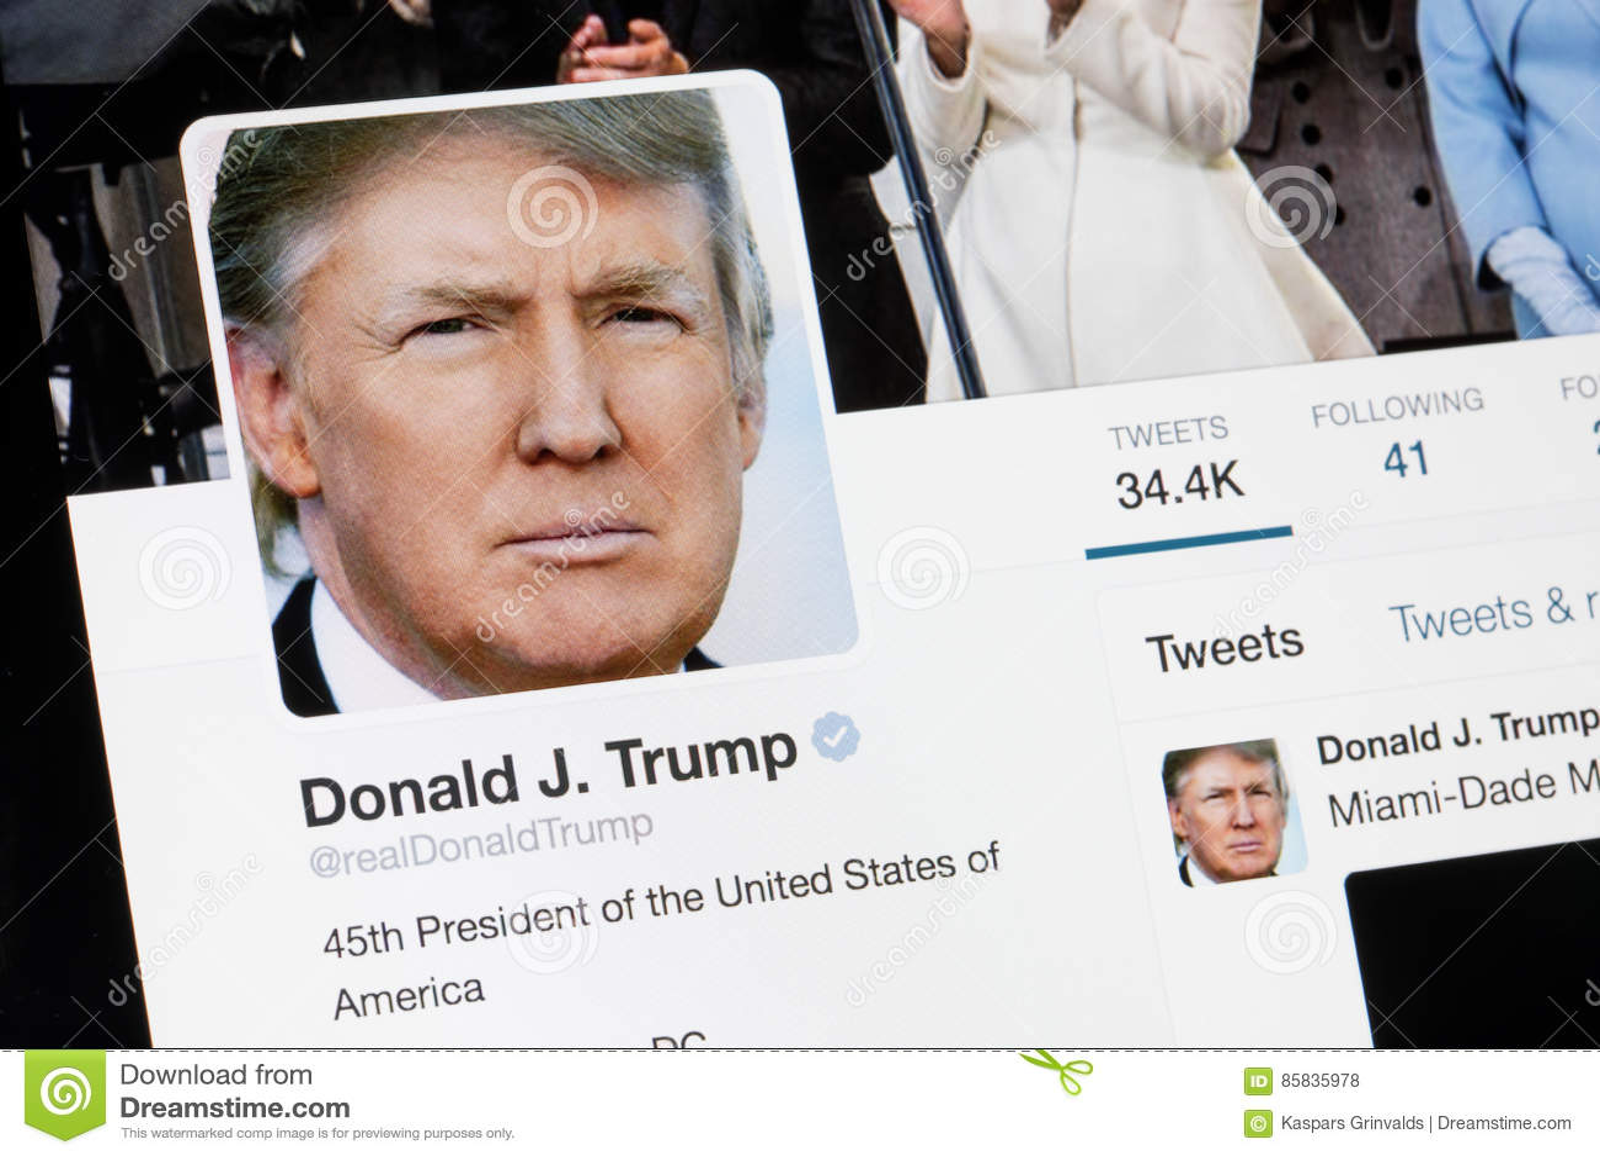 RIGA, LATVIA - February 02, 2017: President of United States of America Donald Trump Twitter profile.